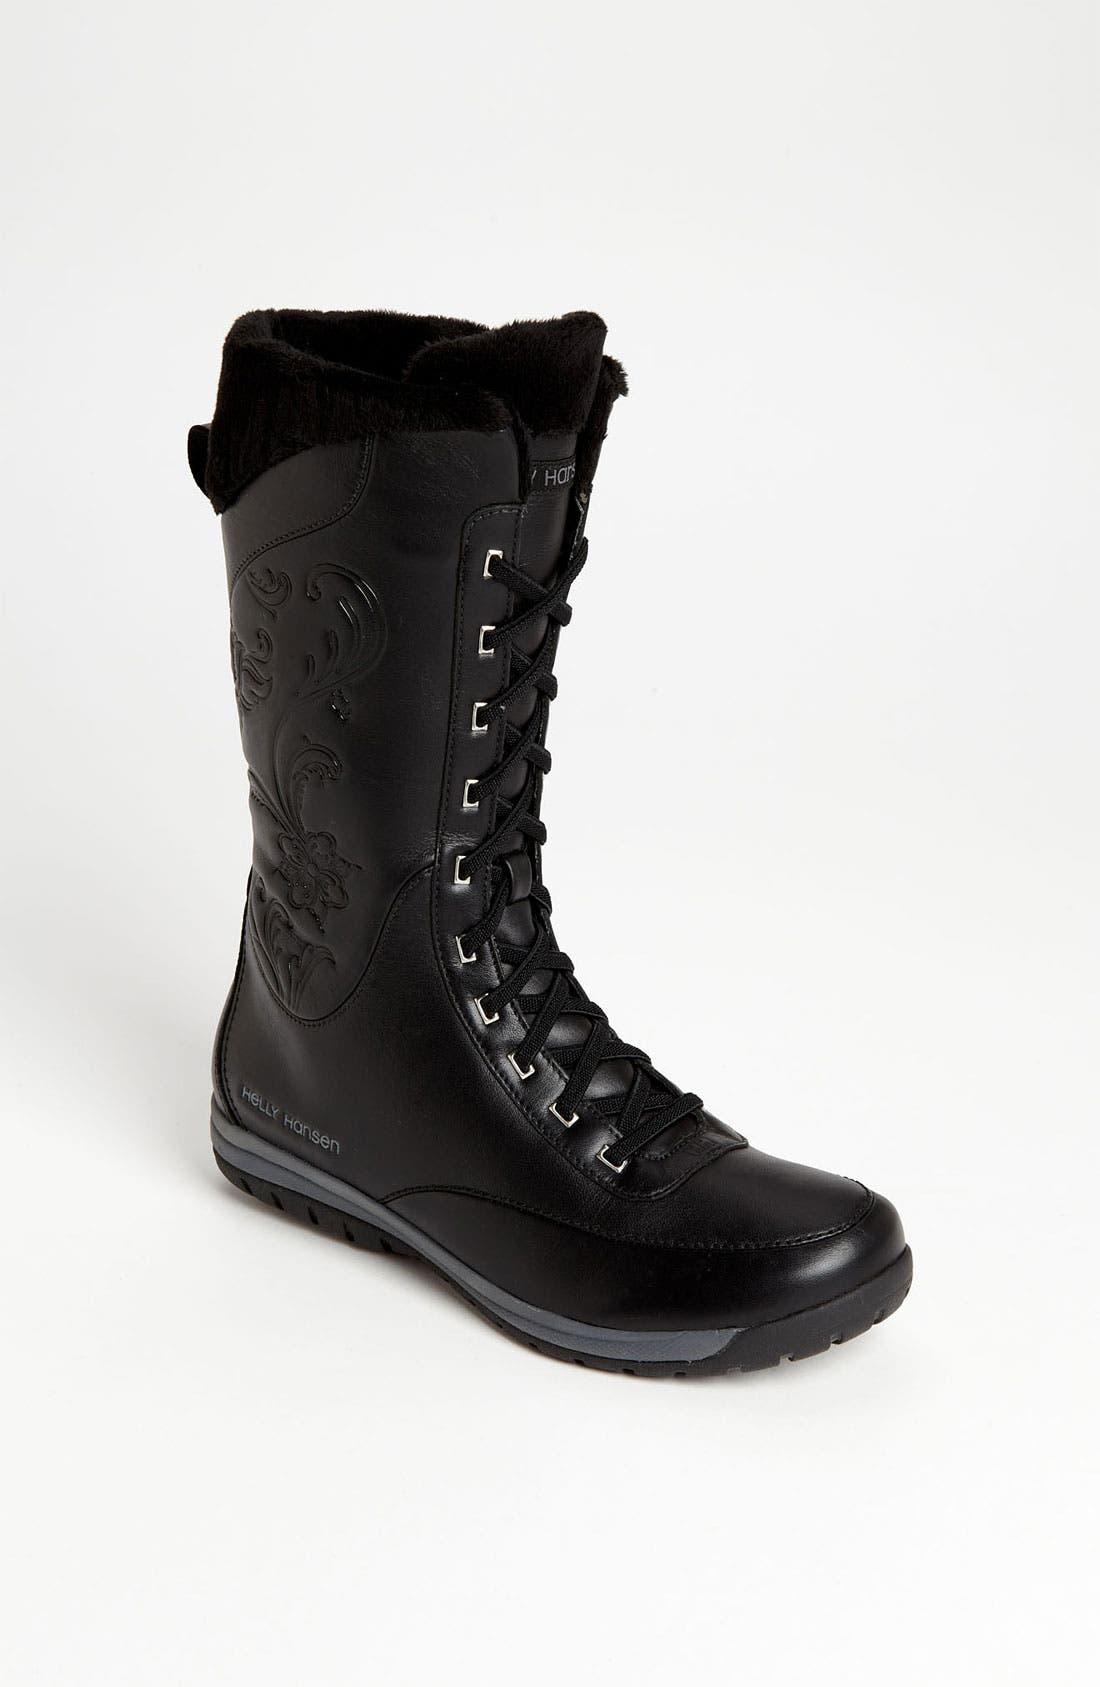 Alternate Image 1 Selected - Helly Hansen 'Eir 3' Boot